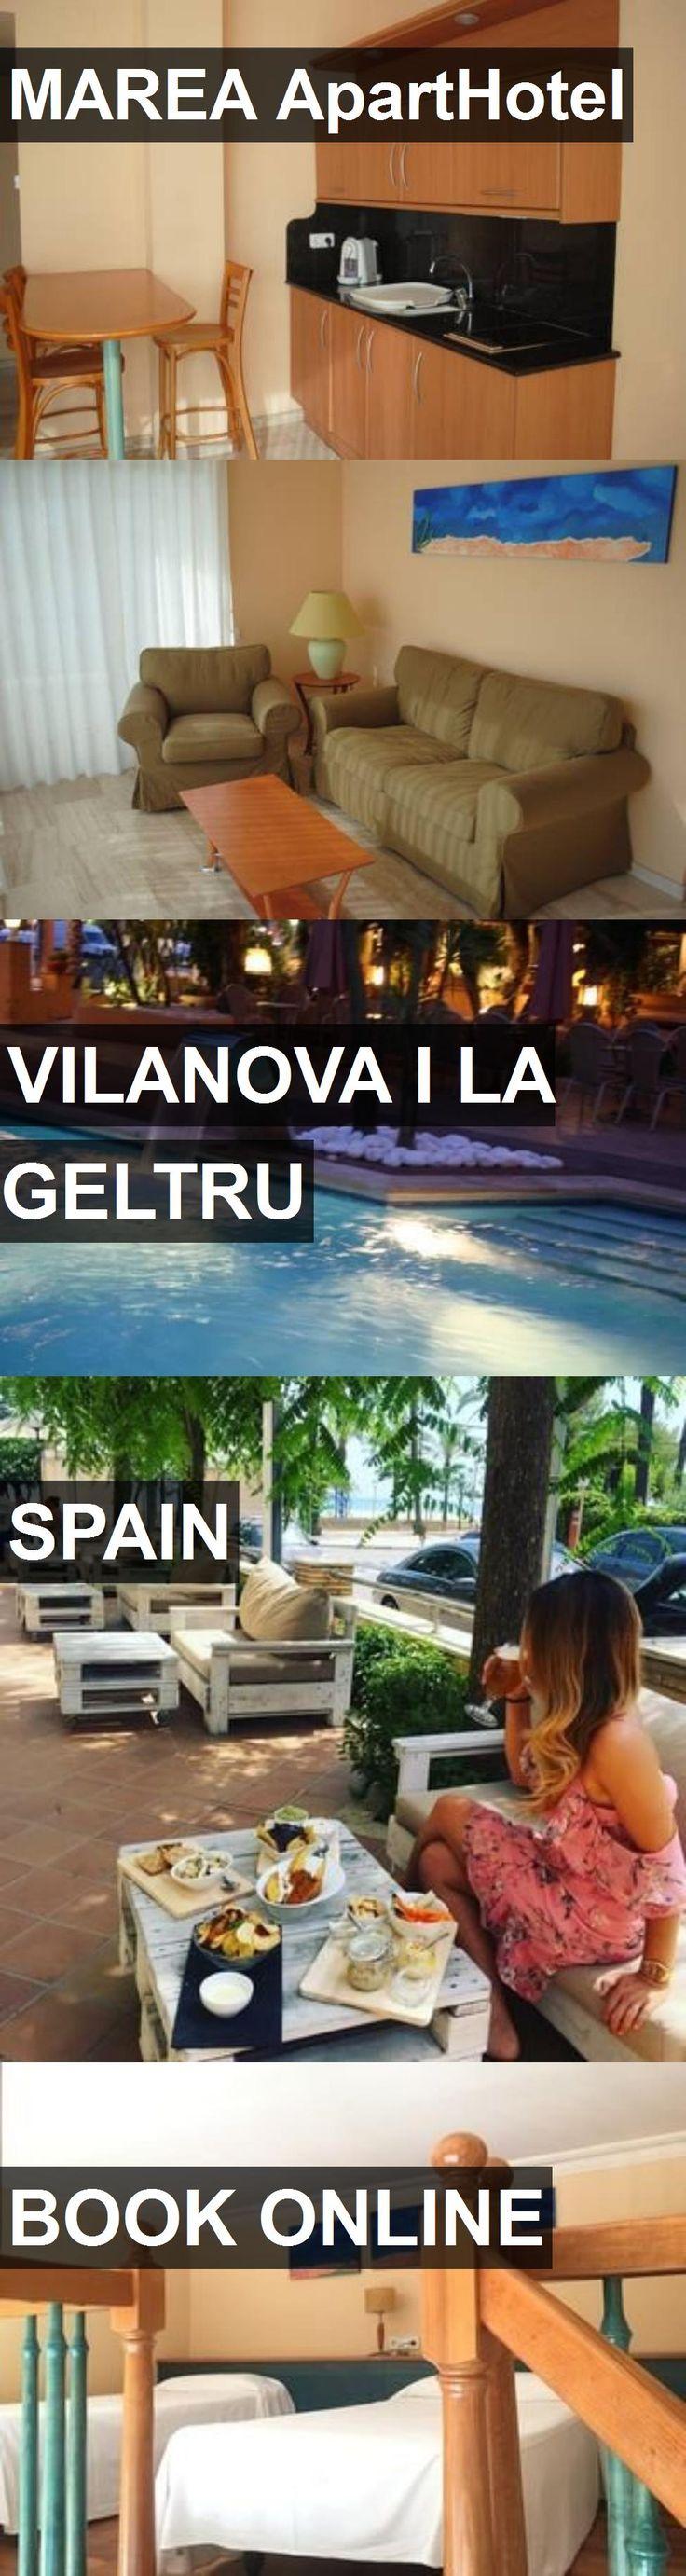 MAREA ApartHotel in Vilanova i la Geltru, Spain. For more information, photos, reviews and best prices please follow the link. #Spain #VilanovailaGeltru #travel #vacation #hotel